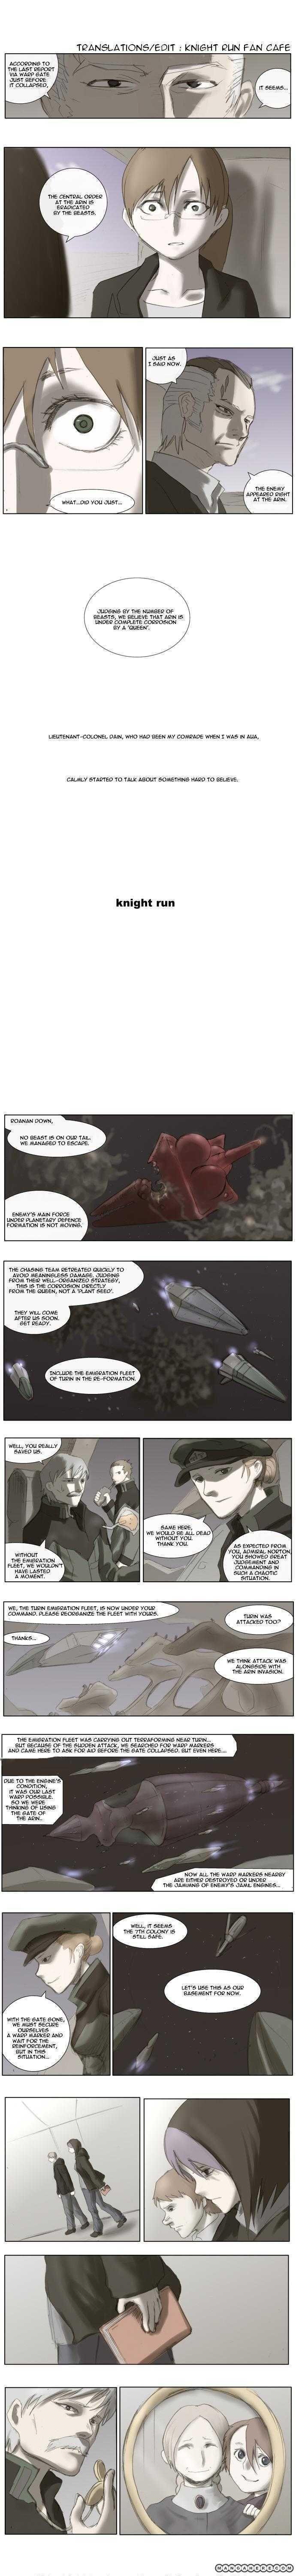 Knight Run 14 Page 1